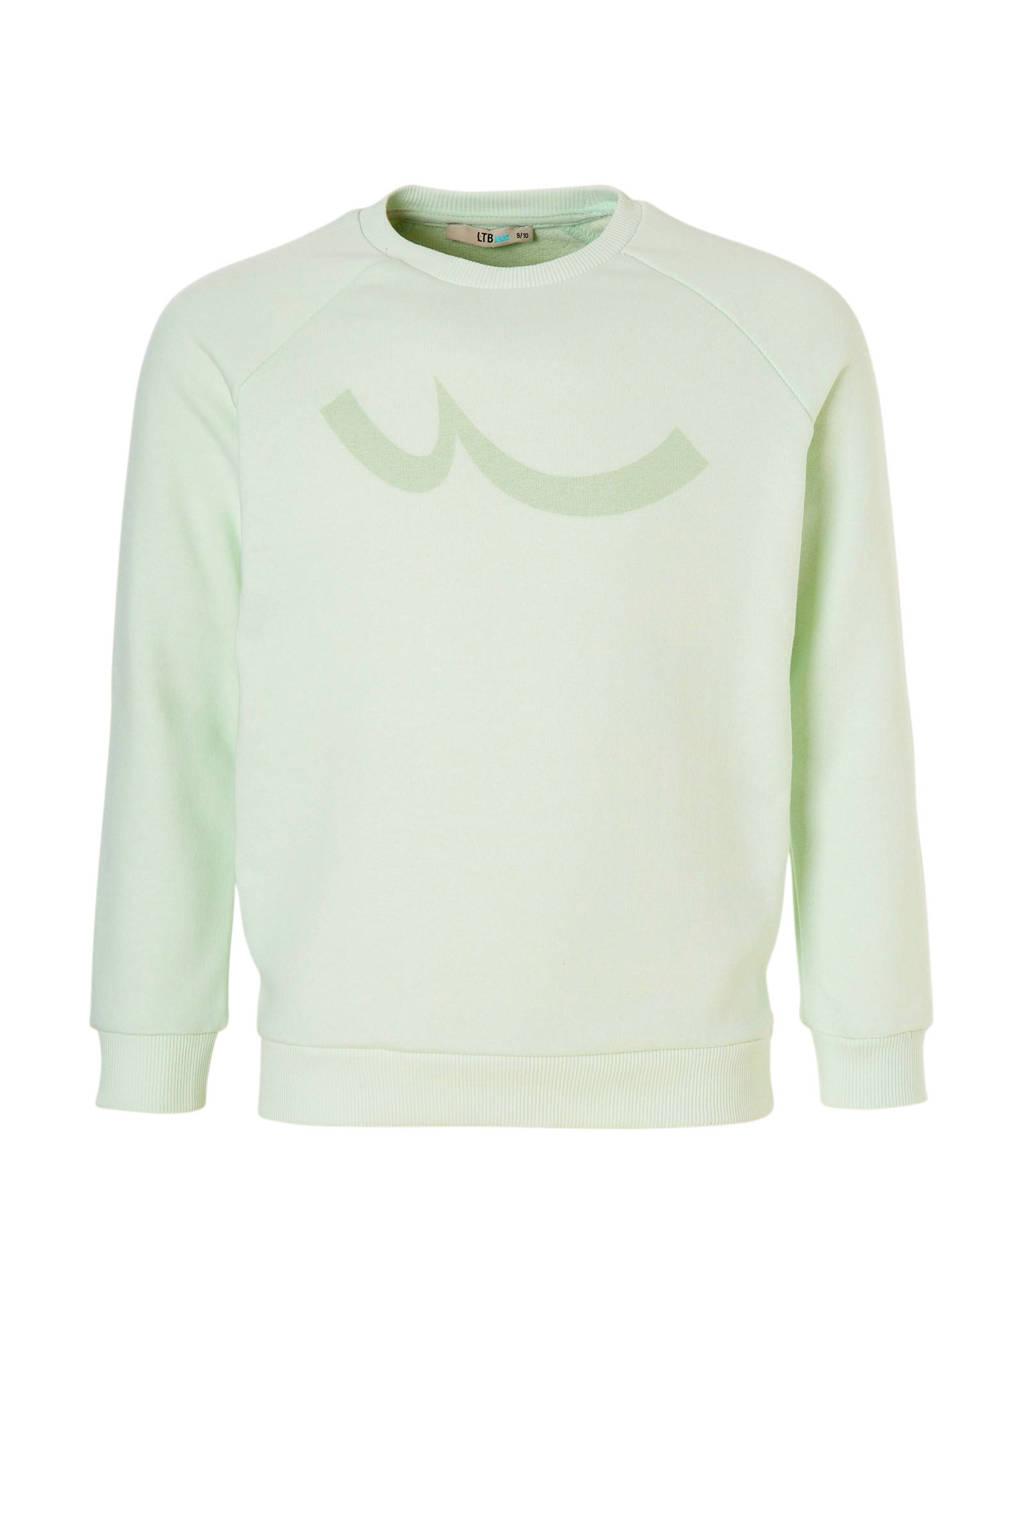 LTB sweater Pizado met printopdruk mintgroen, Mintgroen